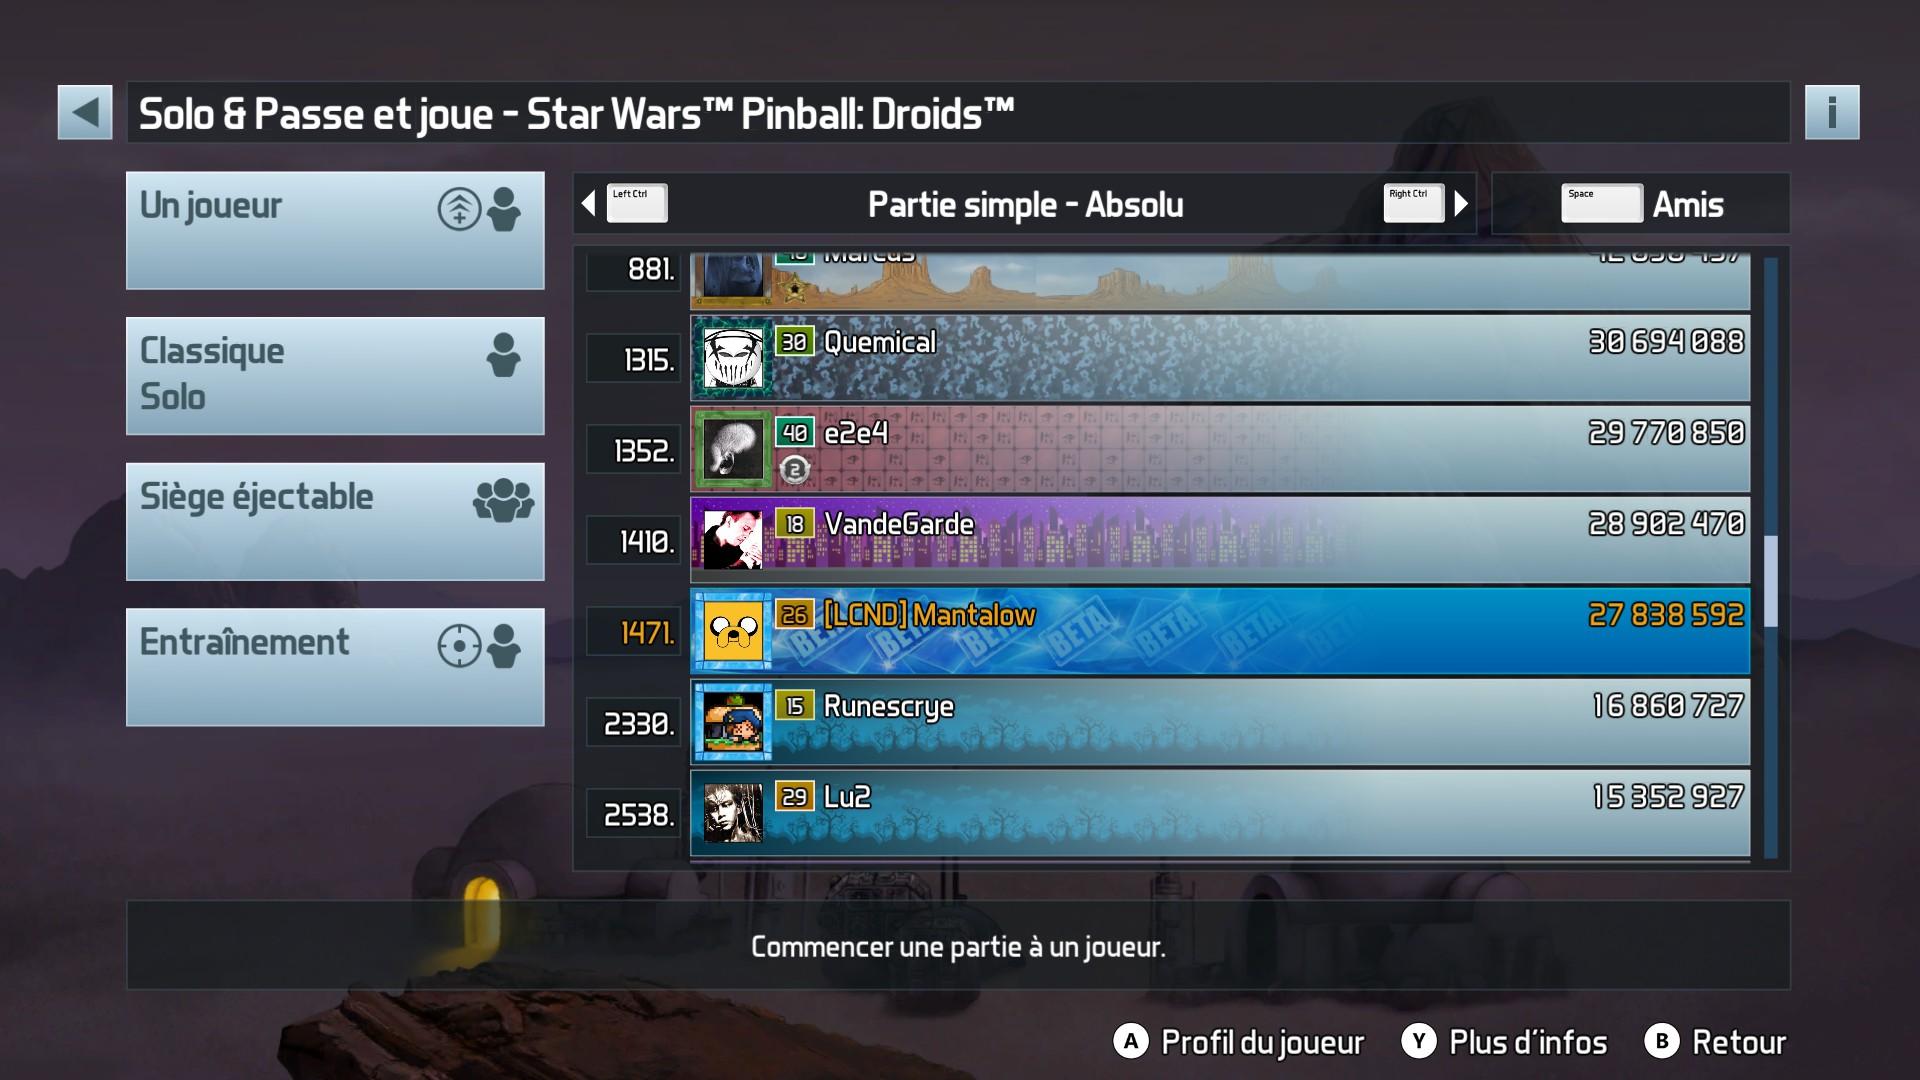 Mantalow: Pinball FX3: Star Wars Pinball: Droids (PC) 27,838,592 points on 2017-12-19 04:40:02